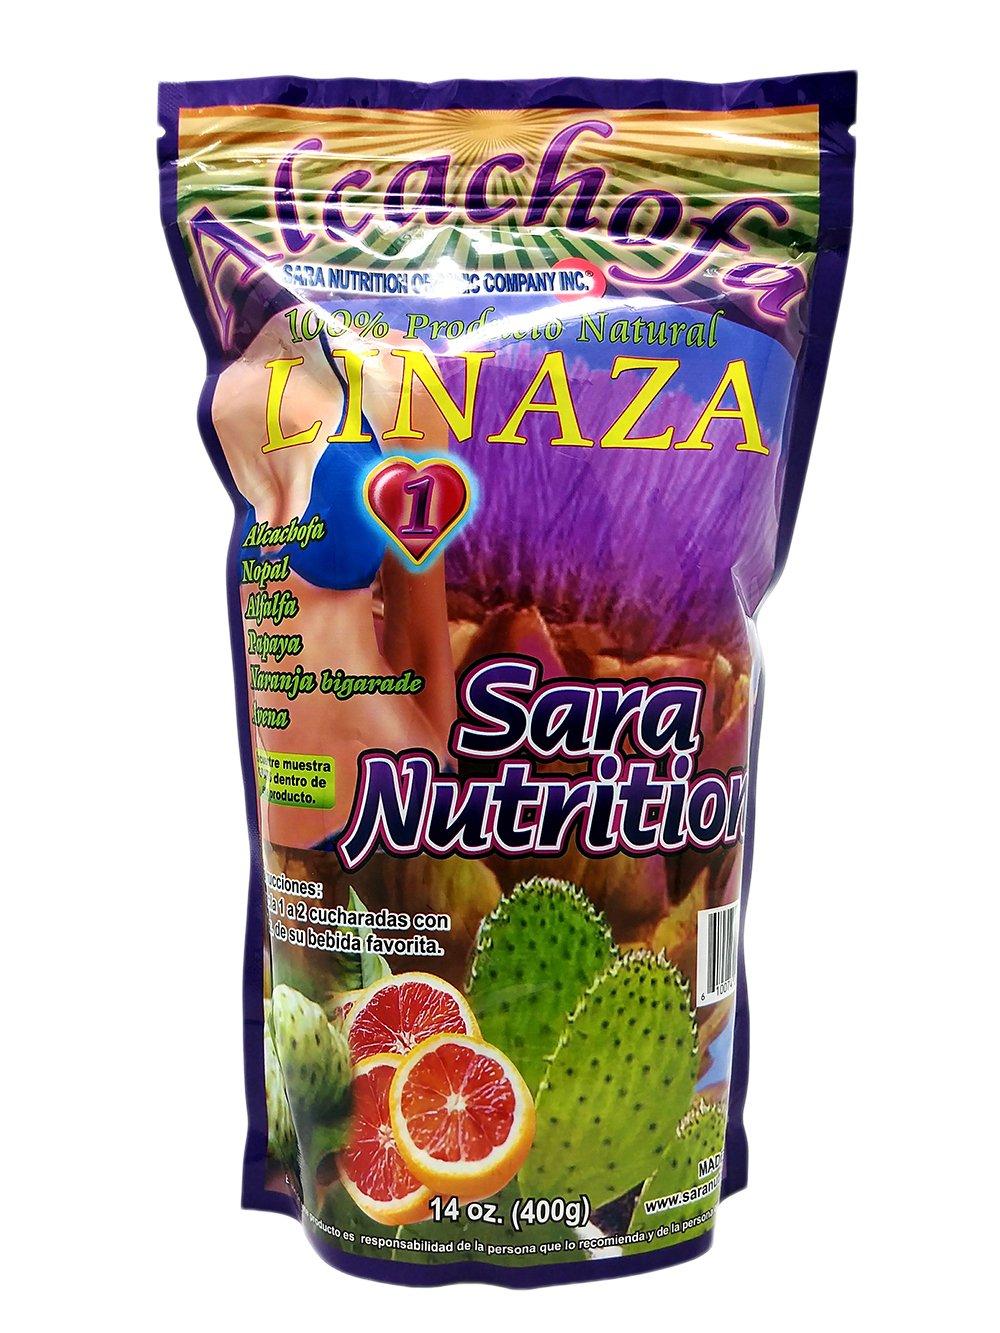 Alcachofa Linaza / Artichoke Flax Seed Powder - 100% Natural Product